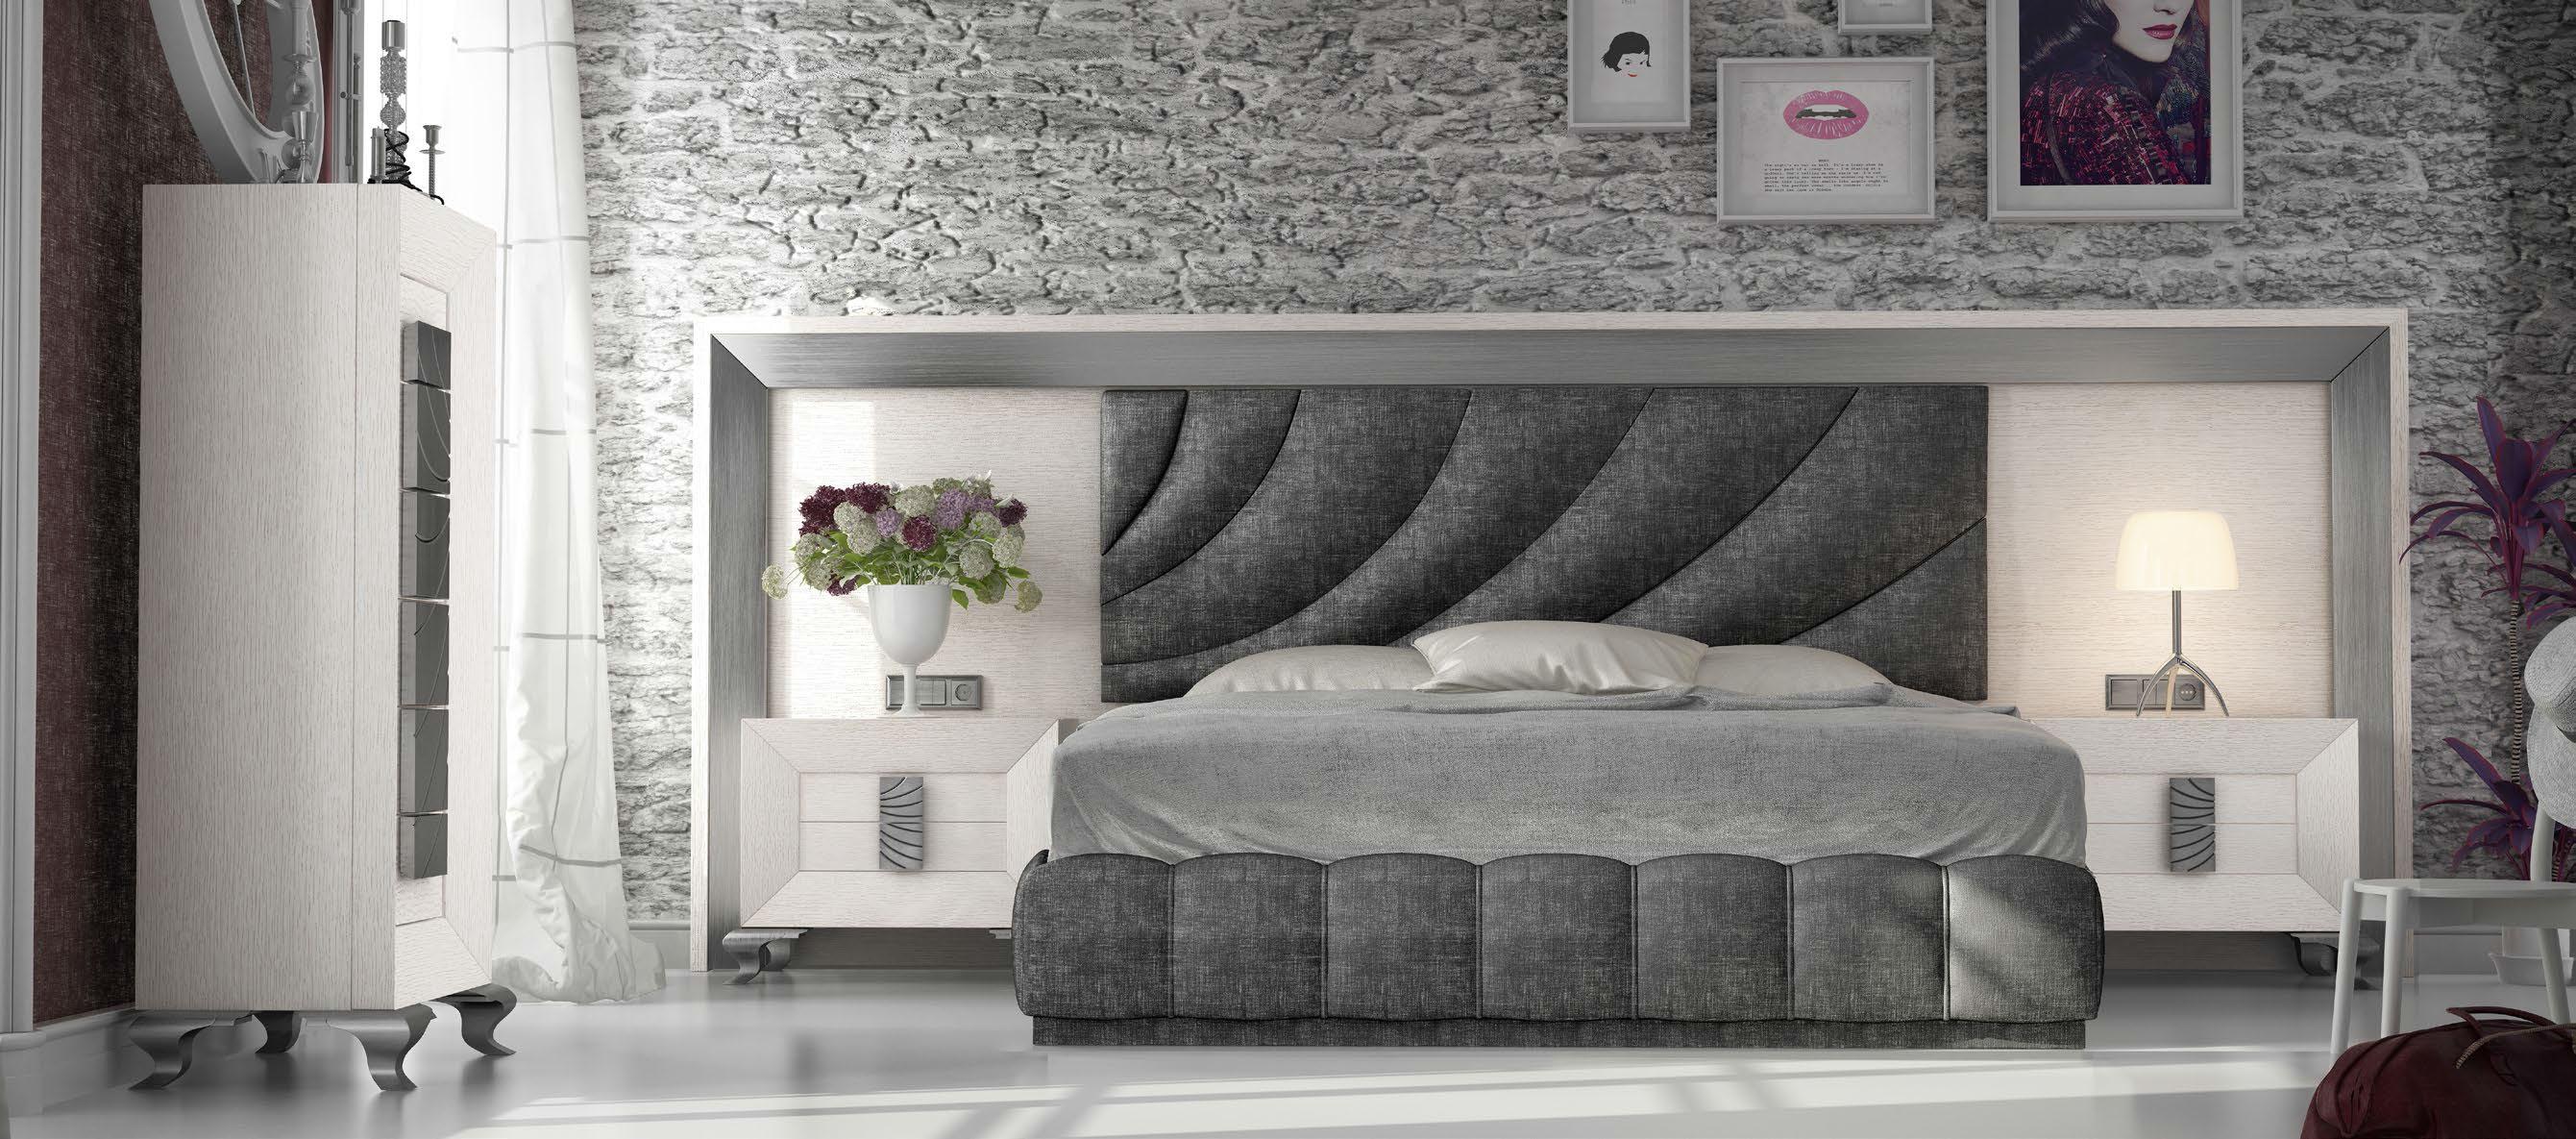 Dor 112 Franco Furniture Bedrooms Vol2 Spain Brands